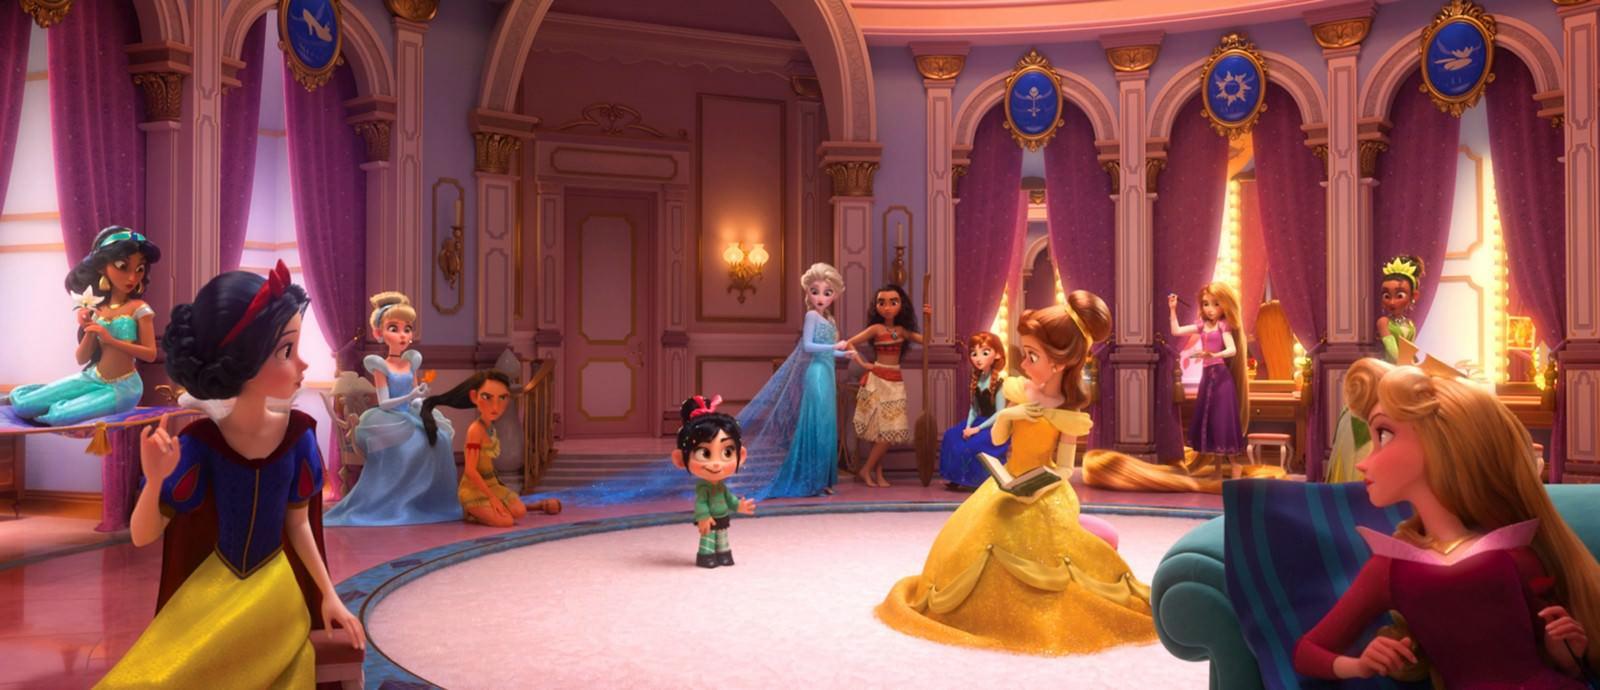 Movie, Ralph Breaks the Internet(美國, 2018年) / 無敵破壞王2:網路大暴走(台灣) / 无敌破坏王2:大闹互联网(中國) / 無敵破壞王2:打爆互聯網(香港), 迪士尼公主/Disney Princess